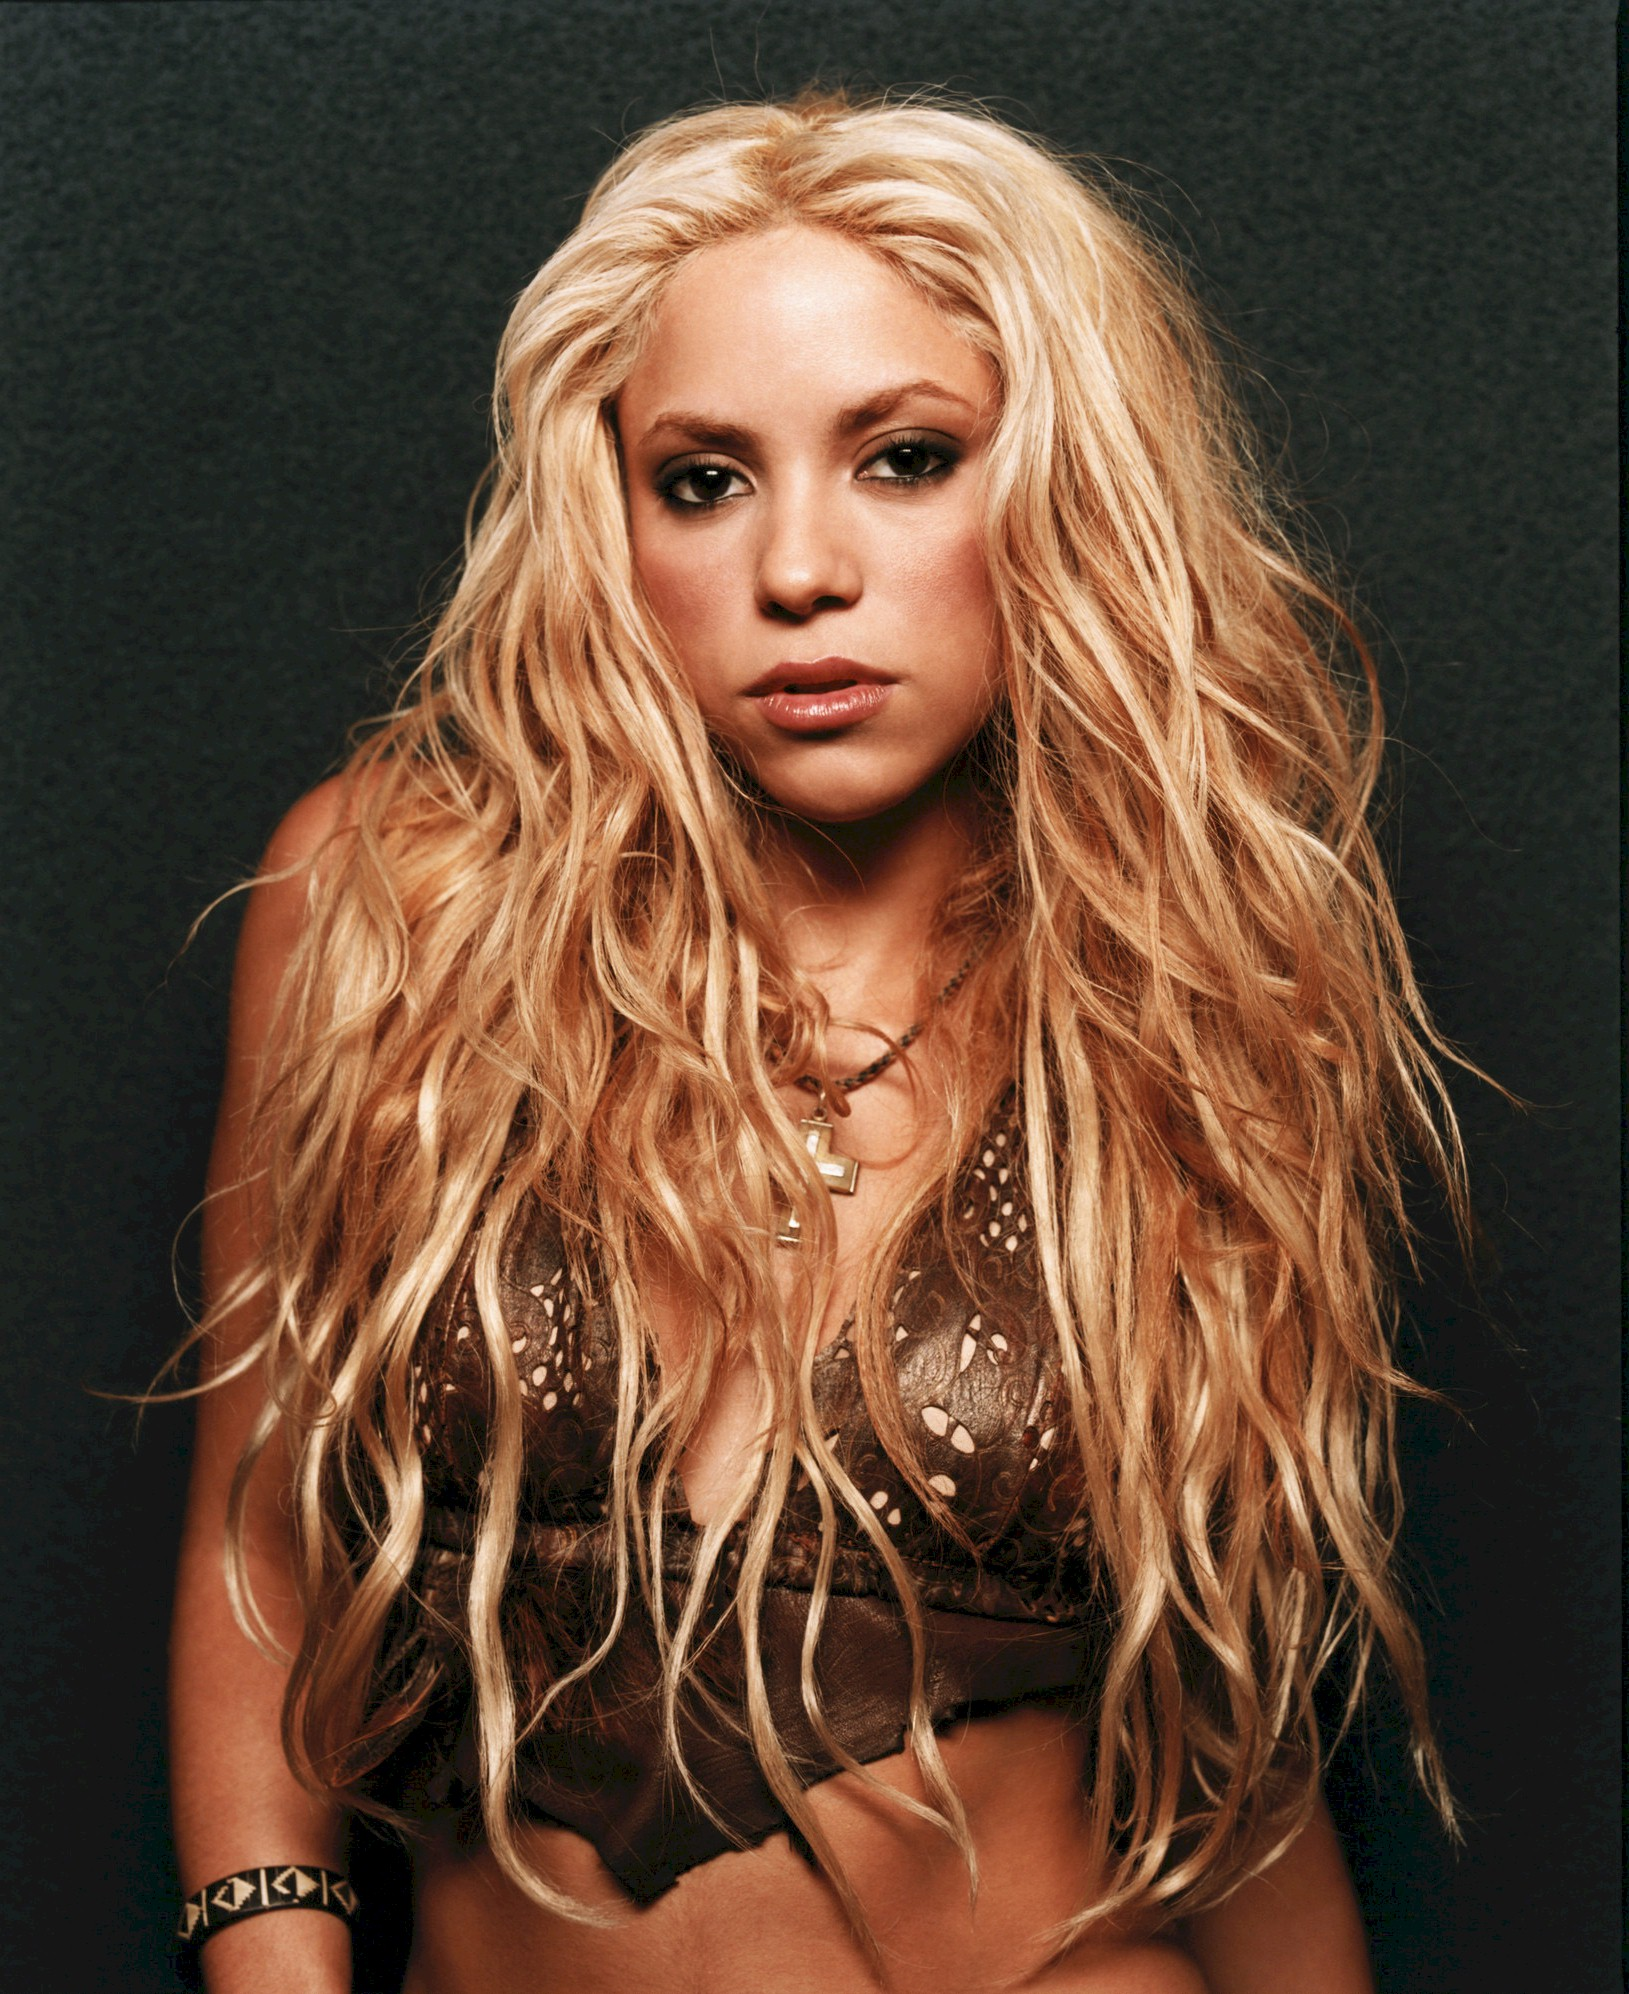 shakira bio Shakira is credited as pop singer and songwriter, la tortura, she wolf shakira, born shakira isabel mebarak ripoll is a colombian singer, songwriter, musician, record producer, dancer.